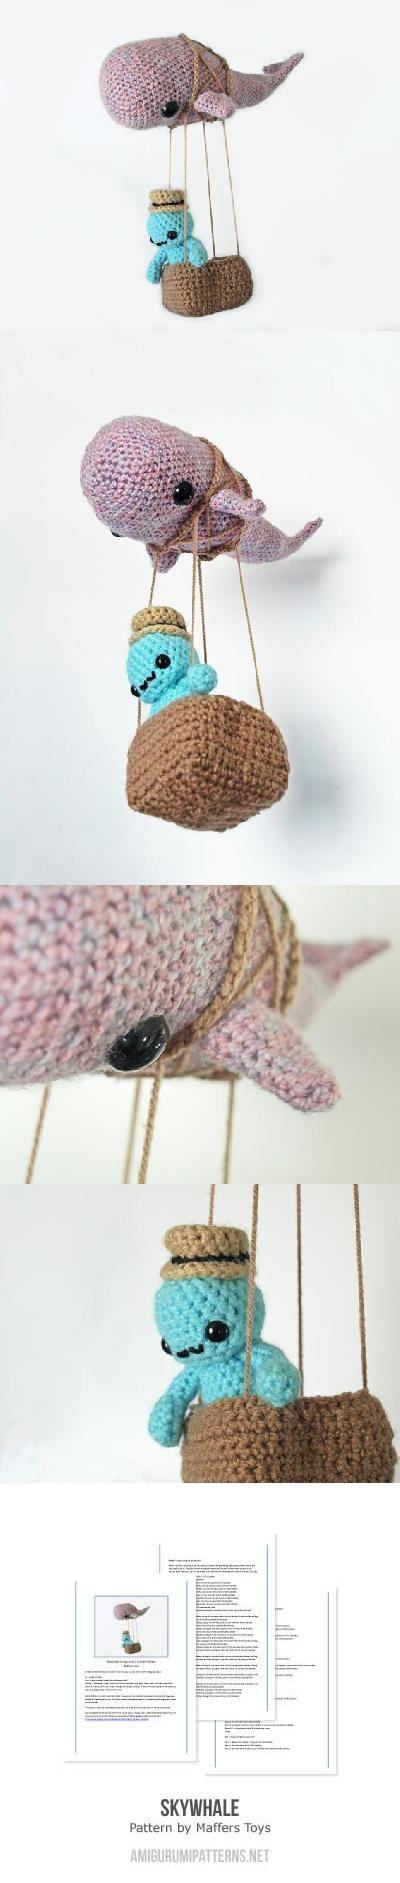 Mejores 175 imágenes de crochet ocean and seashore en Pinterest ...